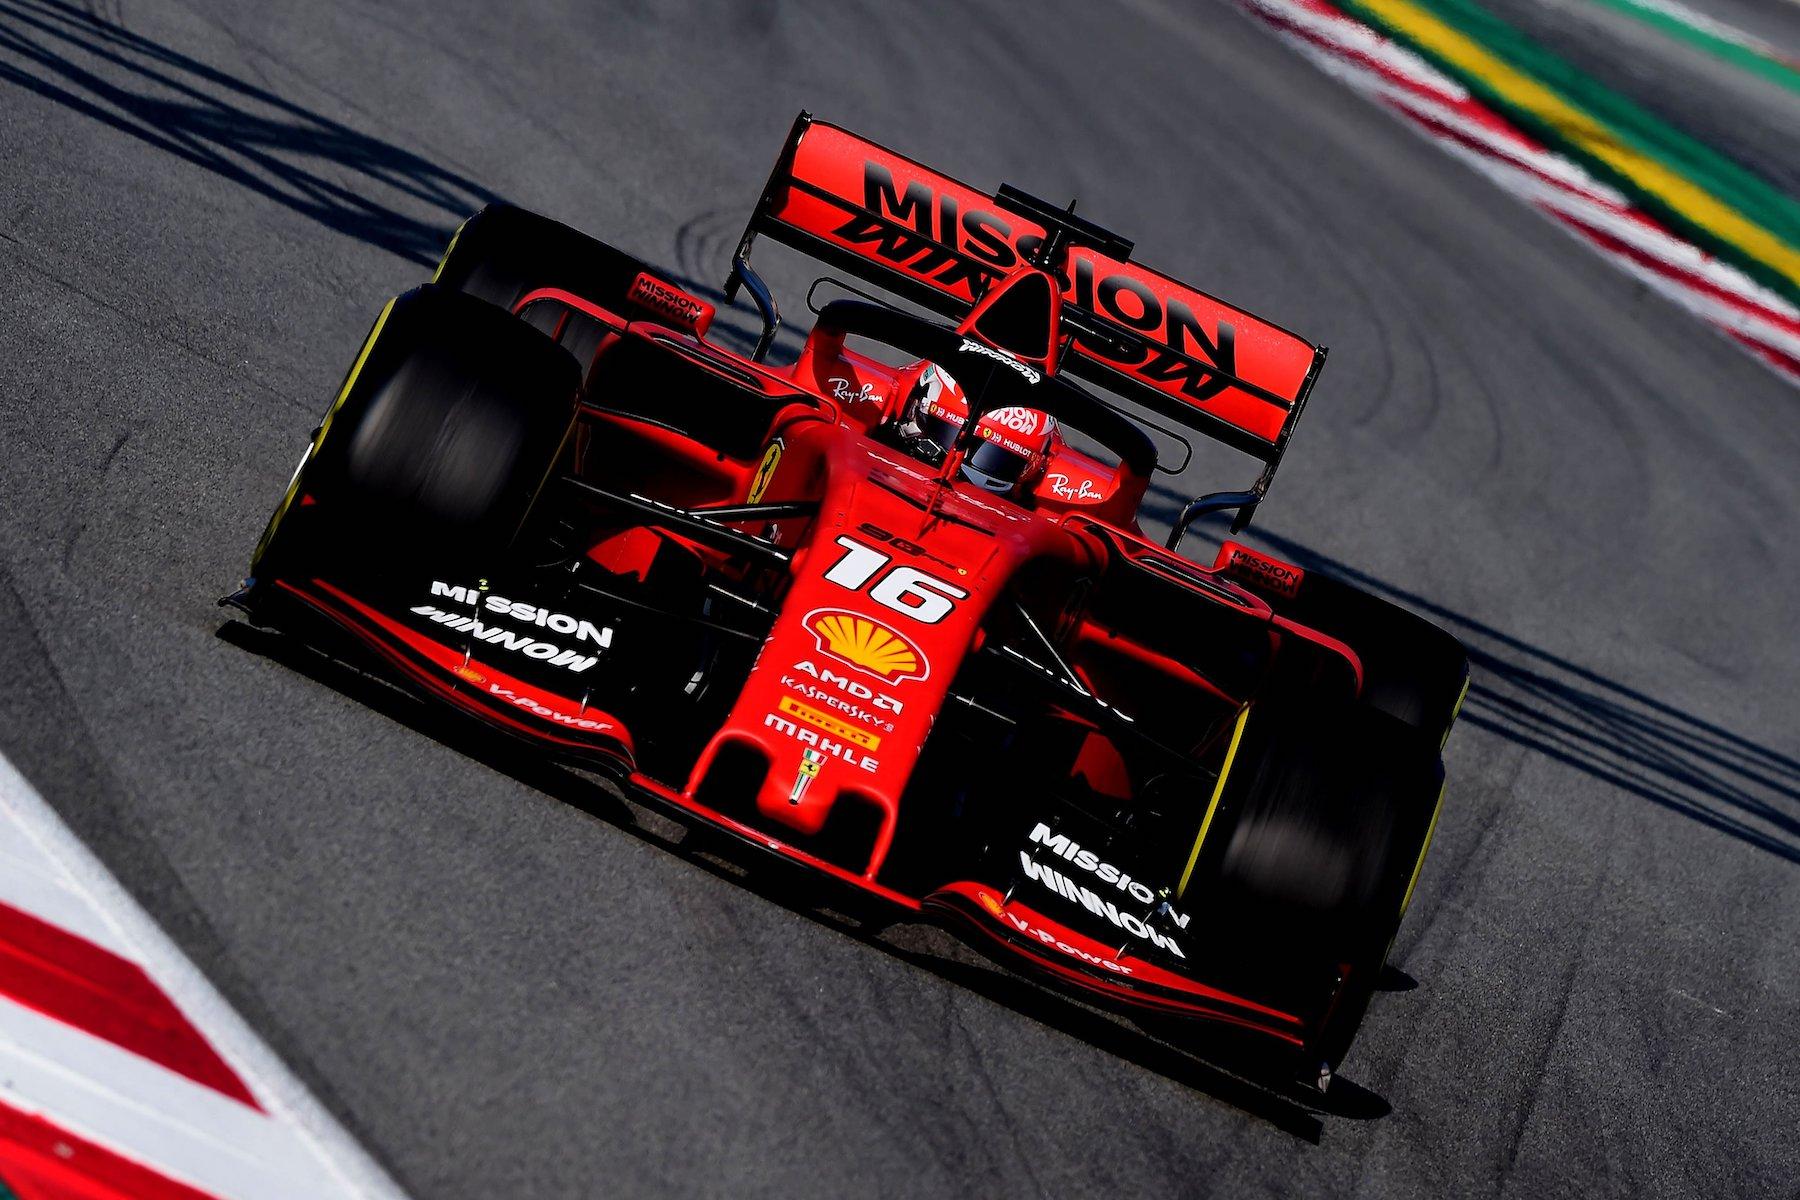 2019 Charles Leclerc   Ferrari SF90   2019 Barcelona T1 D4 1 copy.jpg